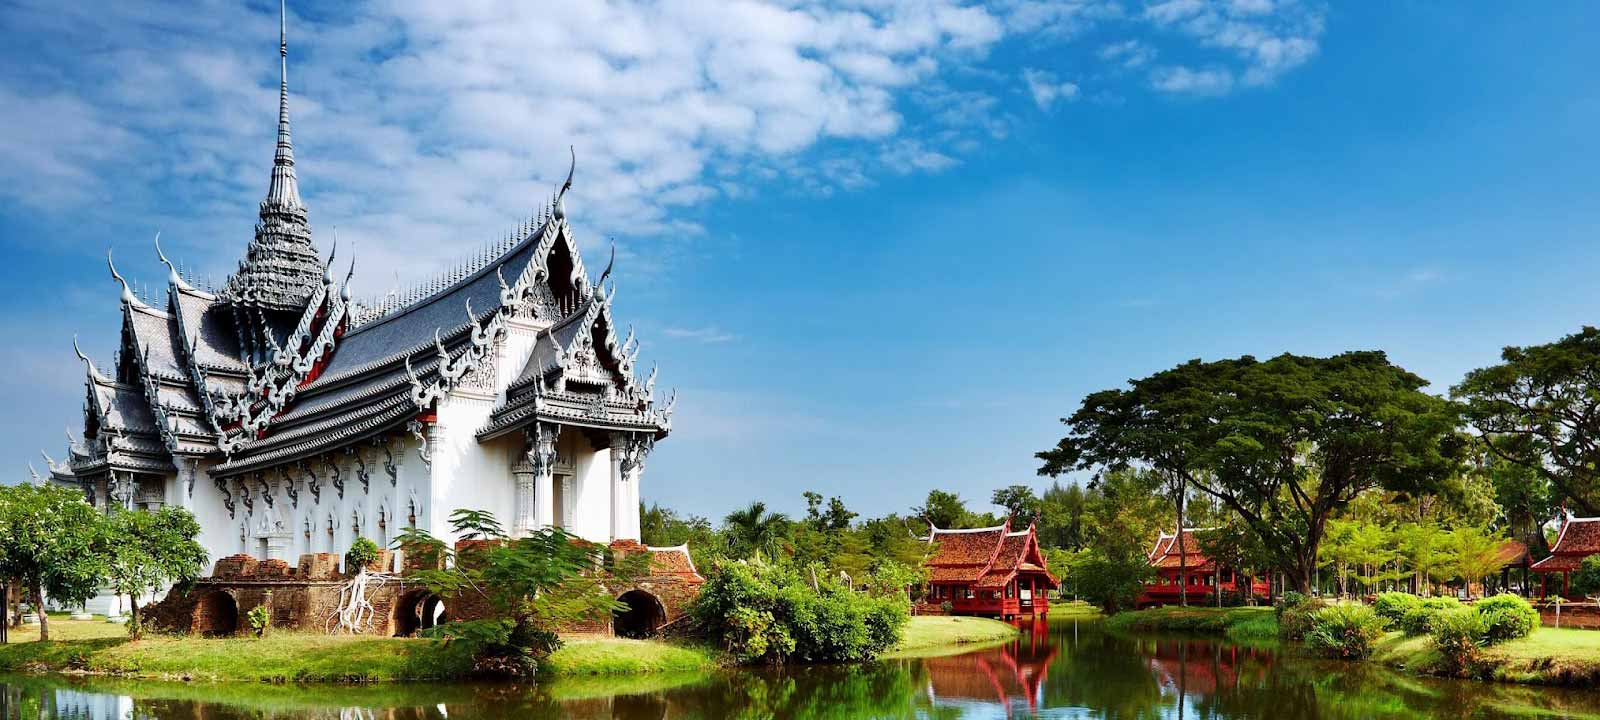 Voyages en Thaïlande